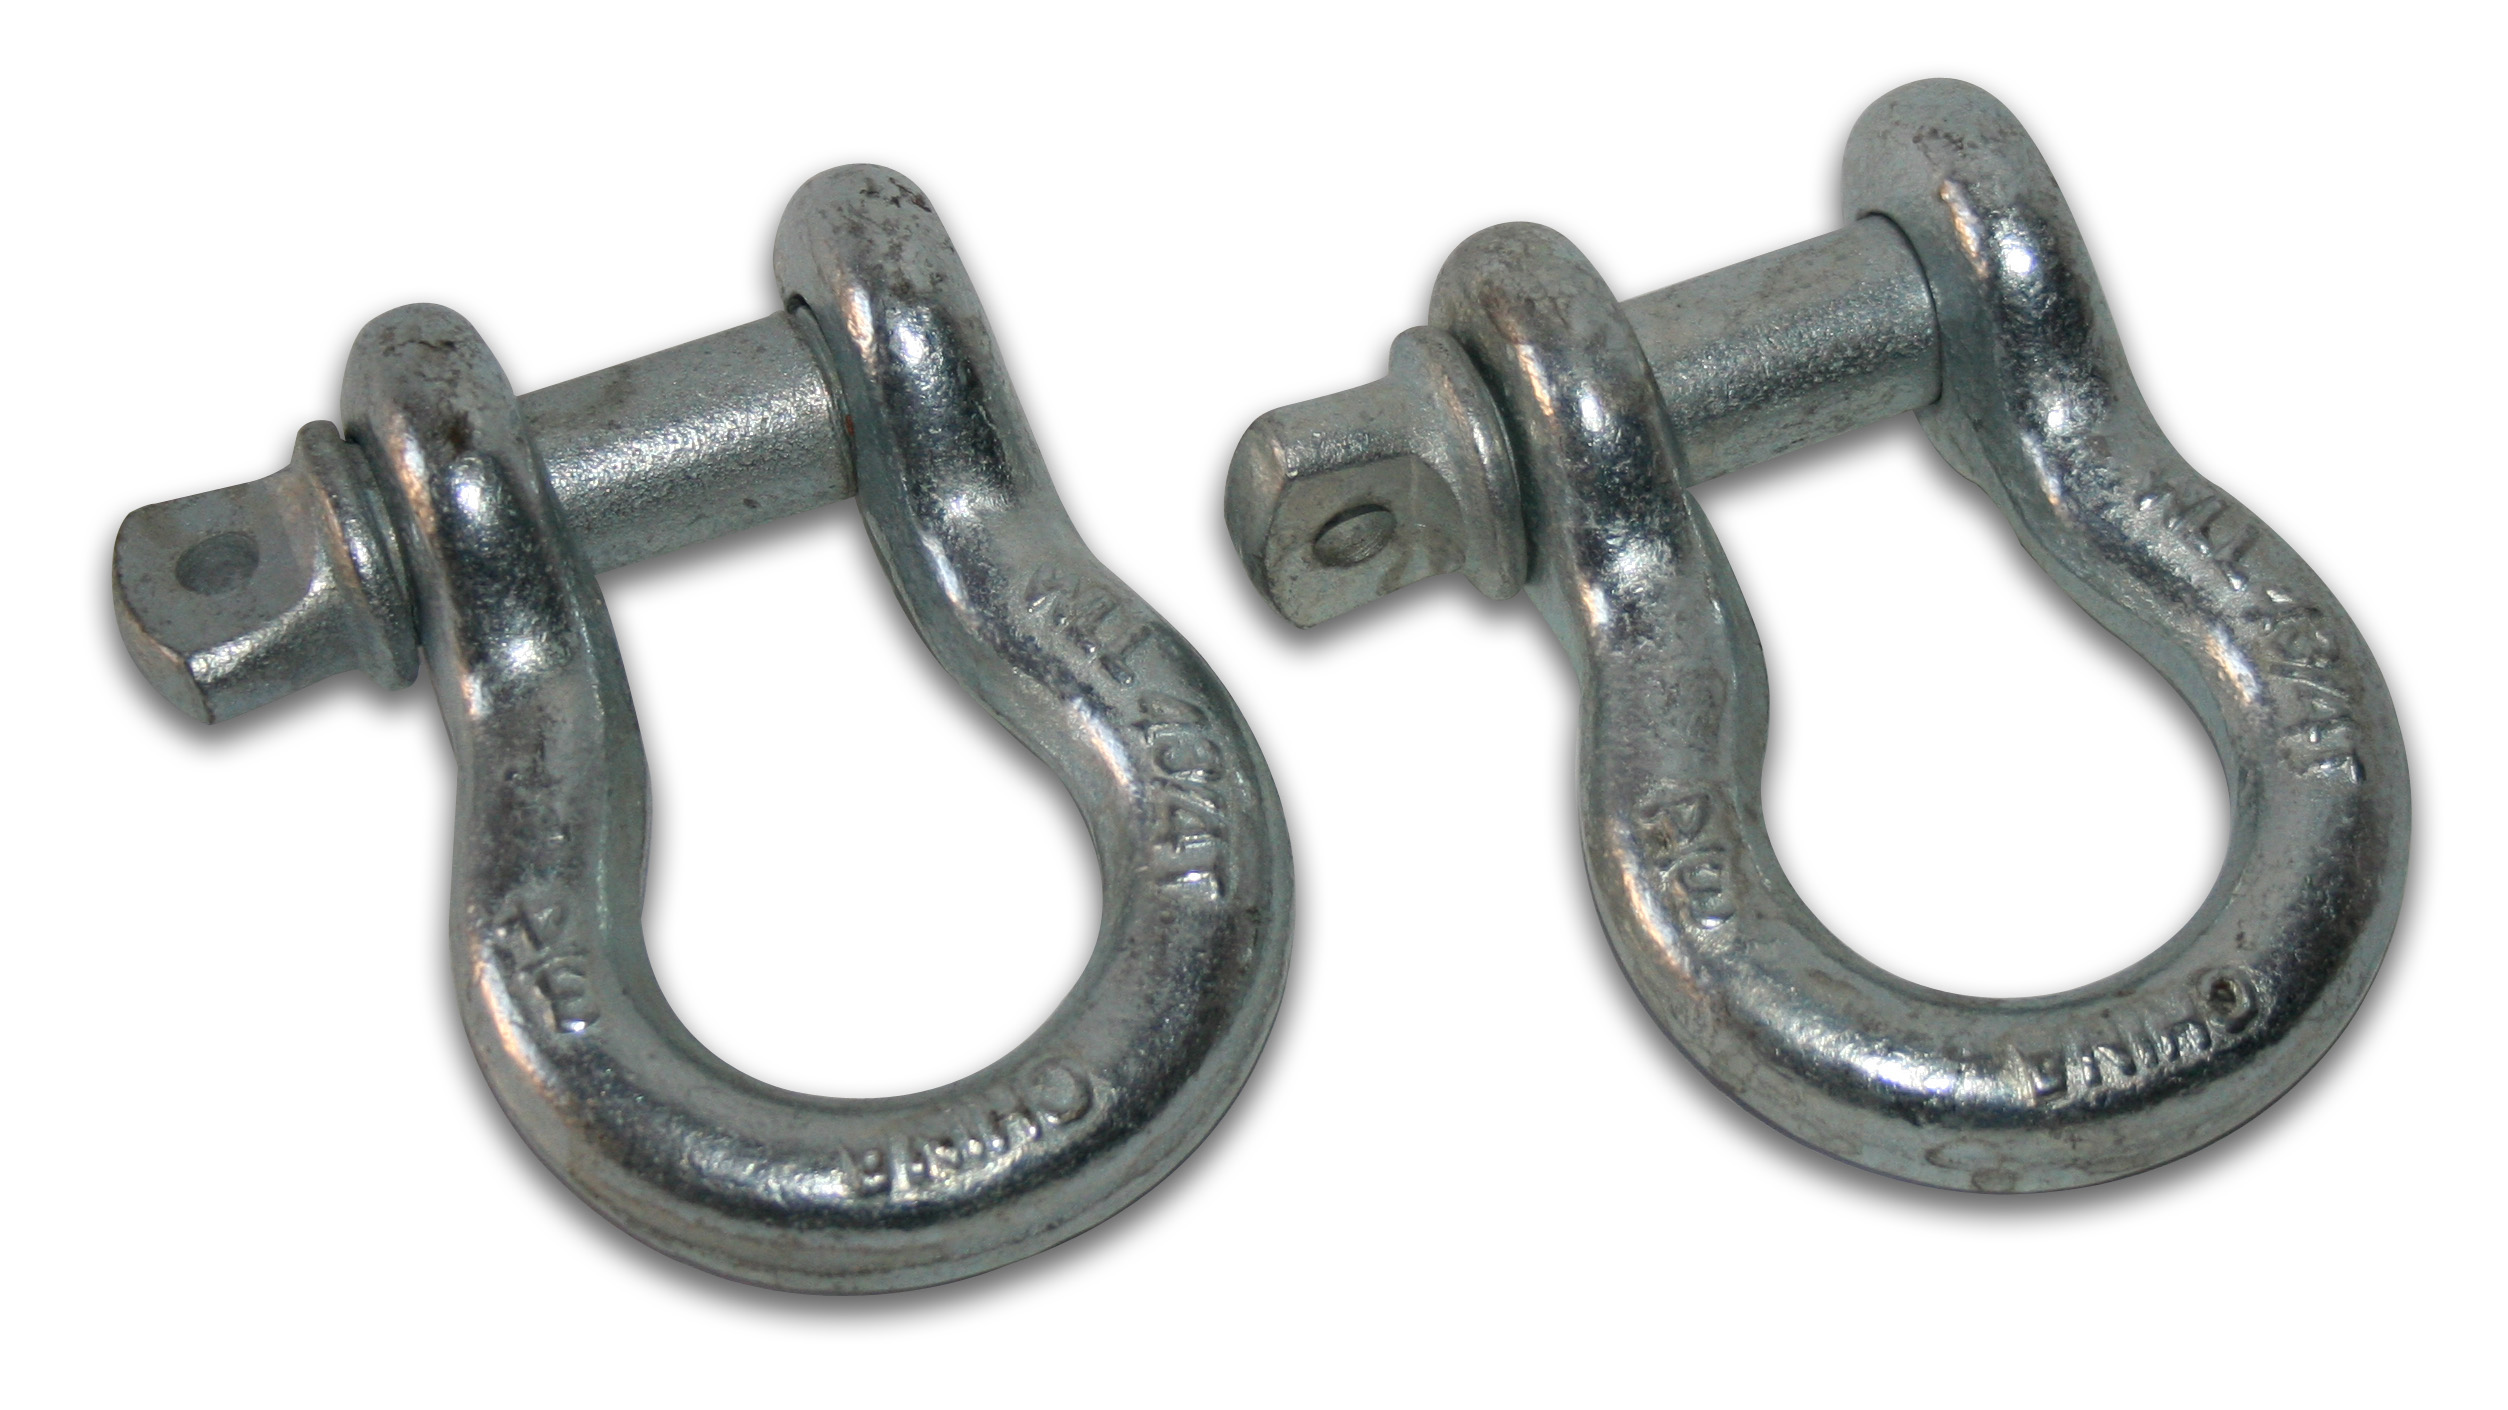 Bulldog Winch 3/4in Shackle, Silver - 9,500lbs WLL